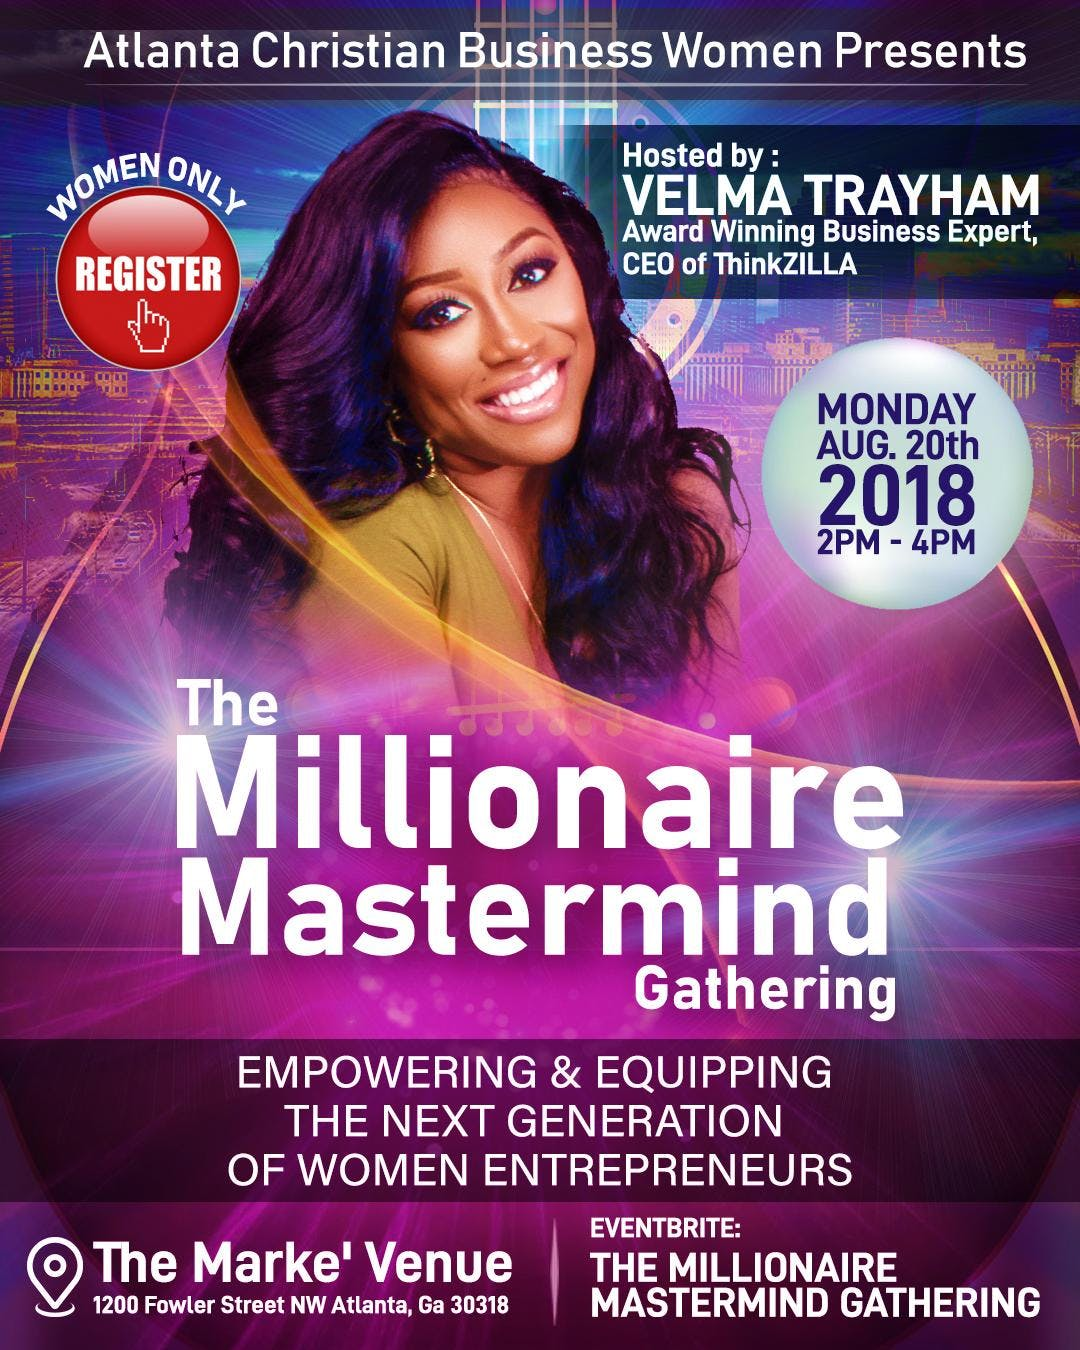 The Millionaire Mastermind Gathering